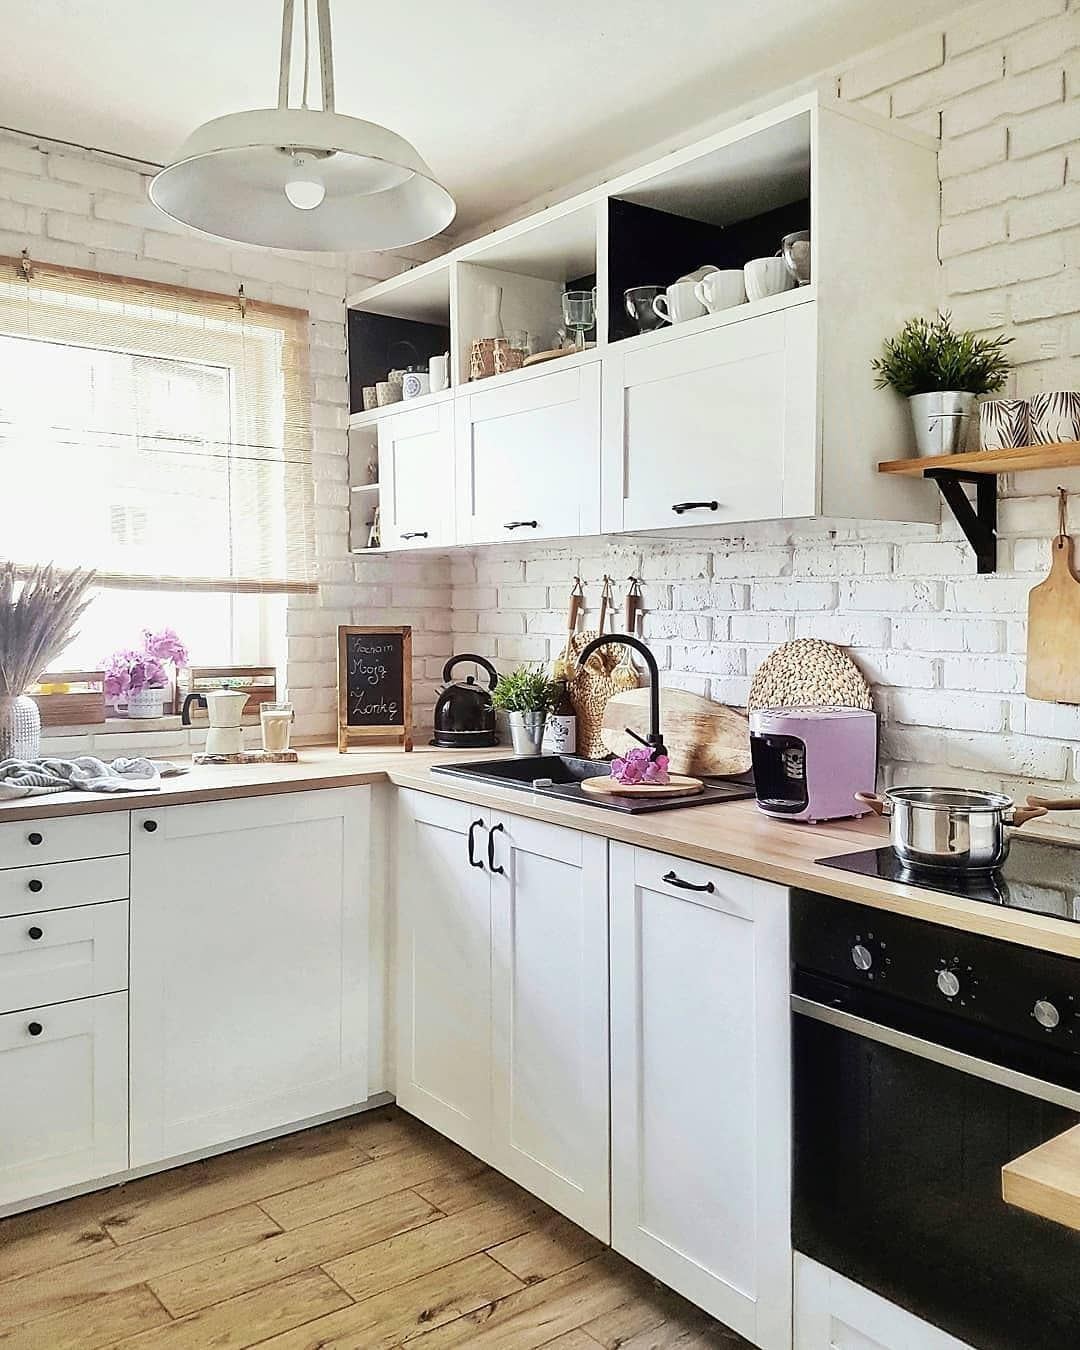 Cucina Bianca E Nera pin di anita21 su cocinas (con immagini) | cucina bianca